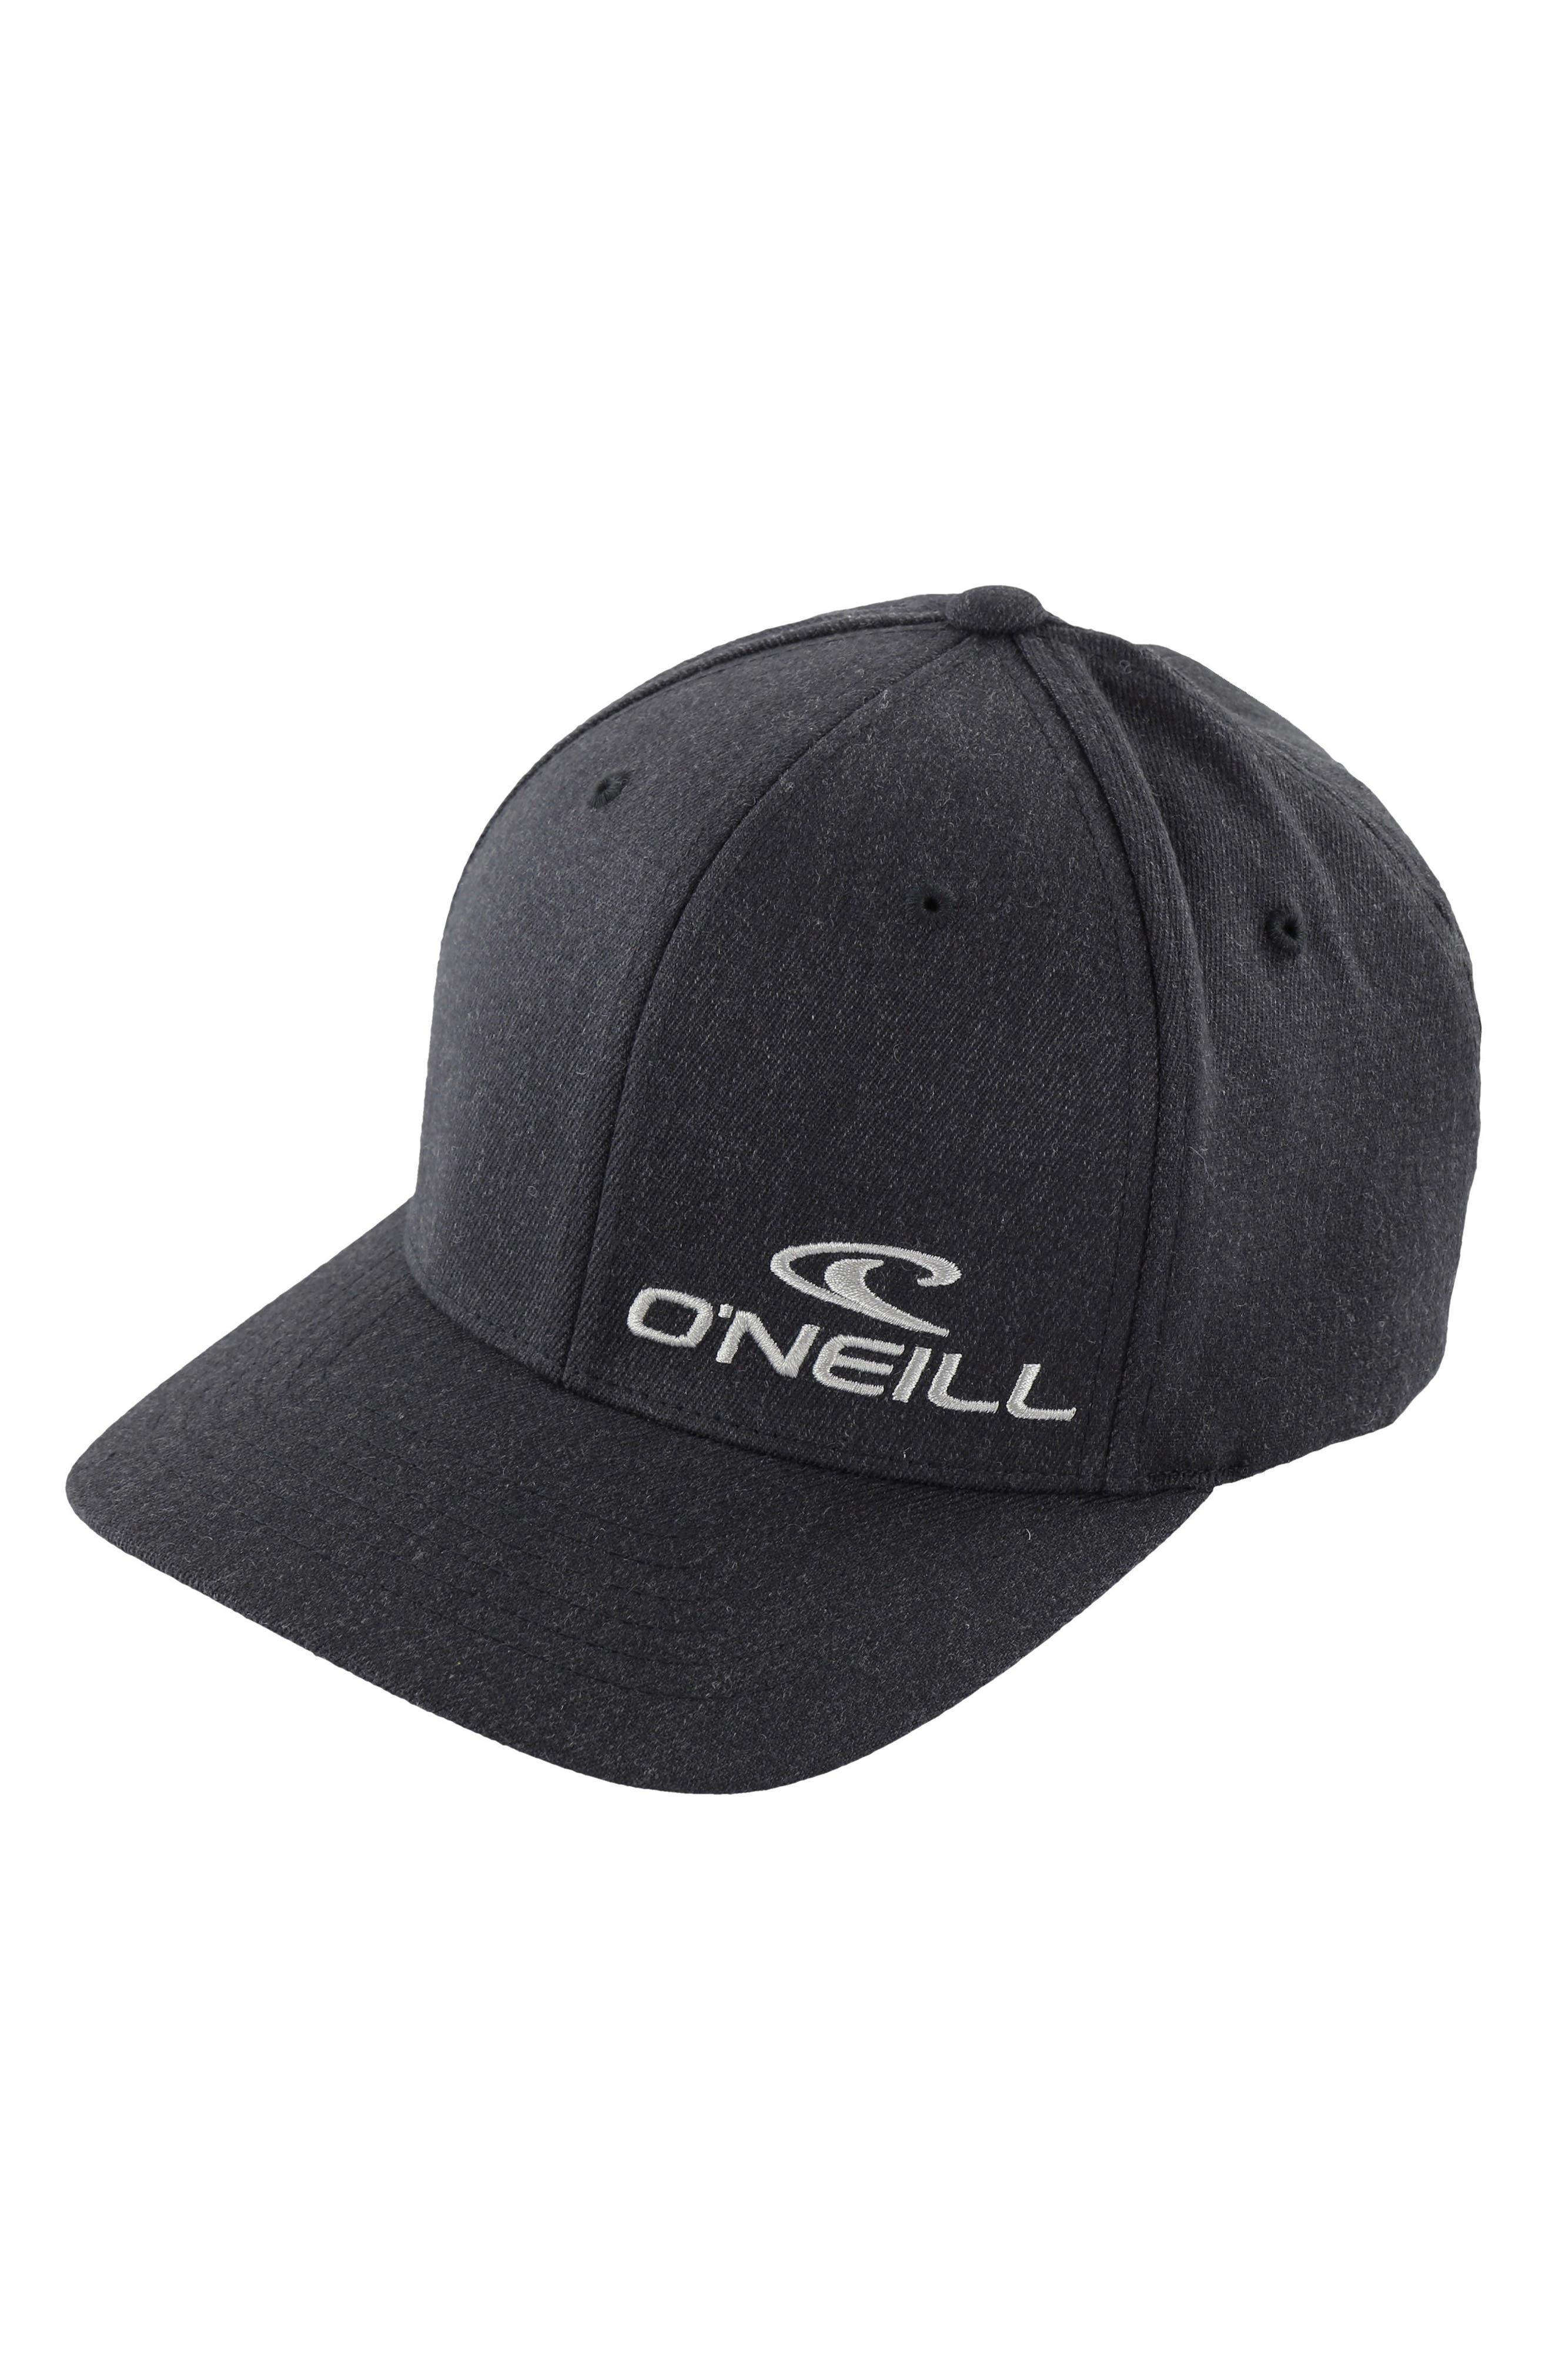 Lodown Ball Cap,                         Main,                         color, 010